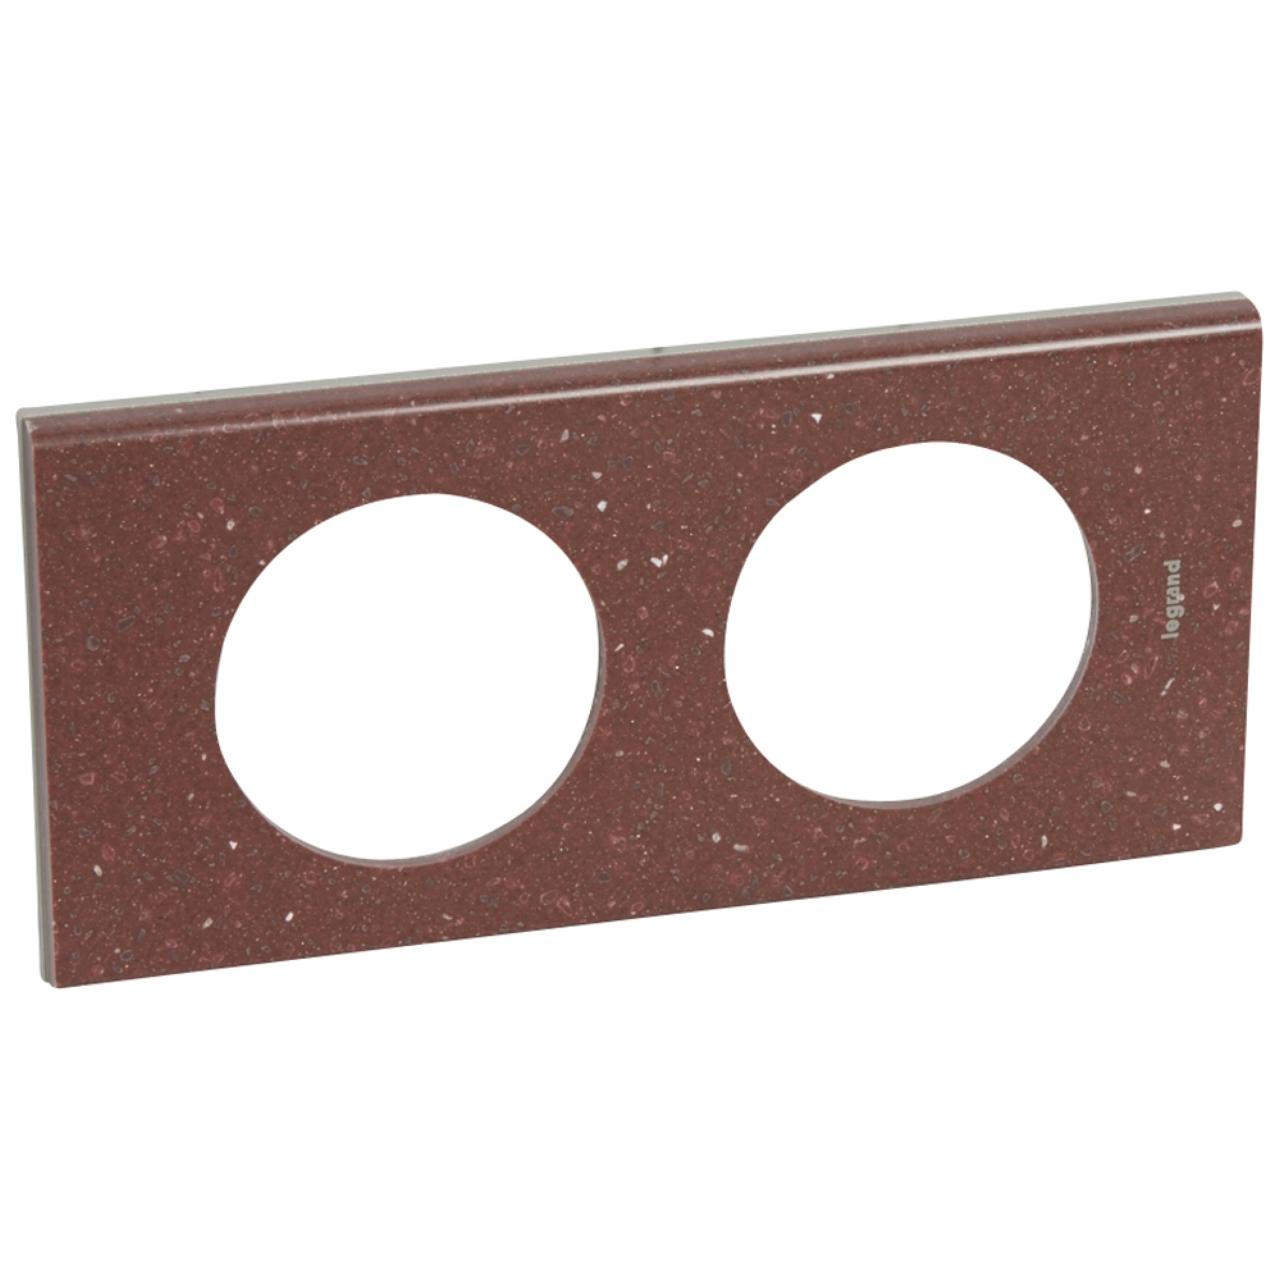 plaque c liane 2 postes corian pompei red 71 97. Black Bedroom Furniture Sets. Home Design Ideas